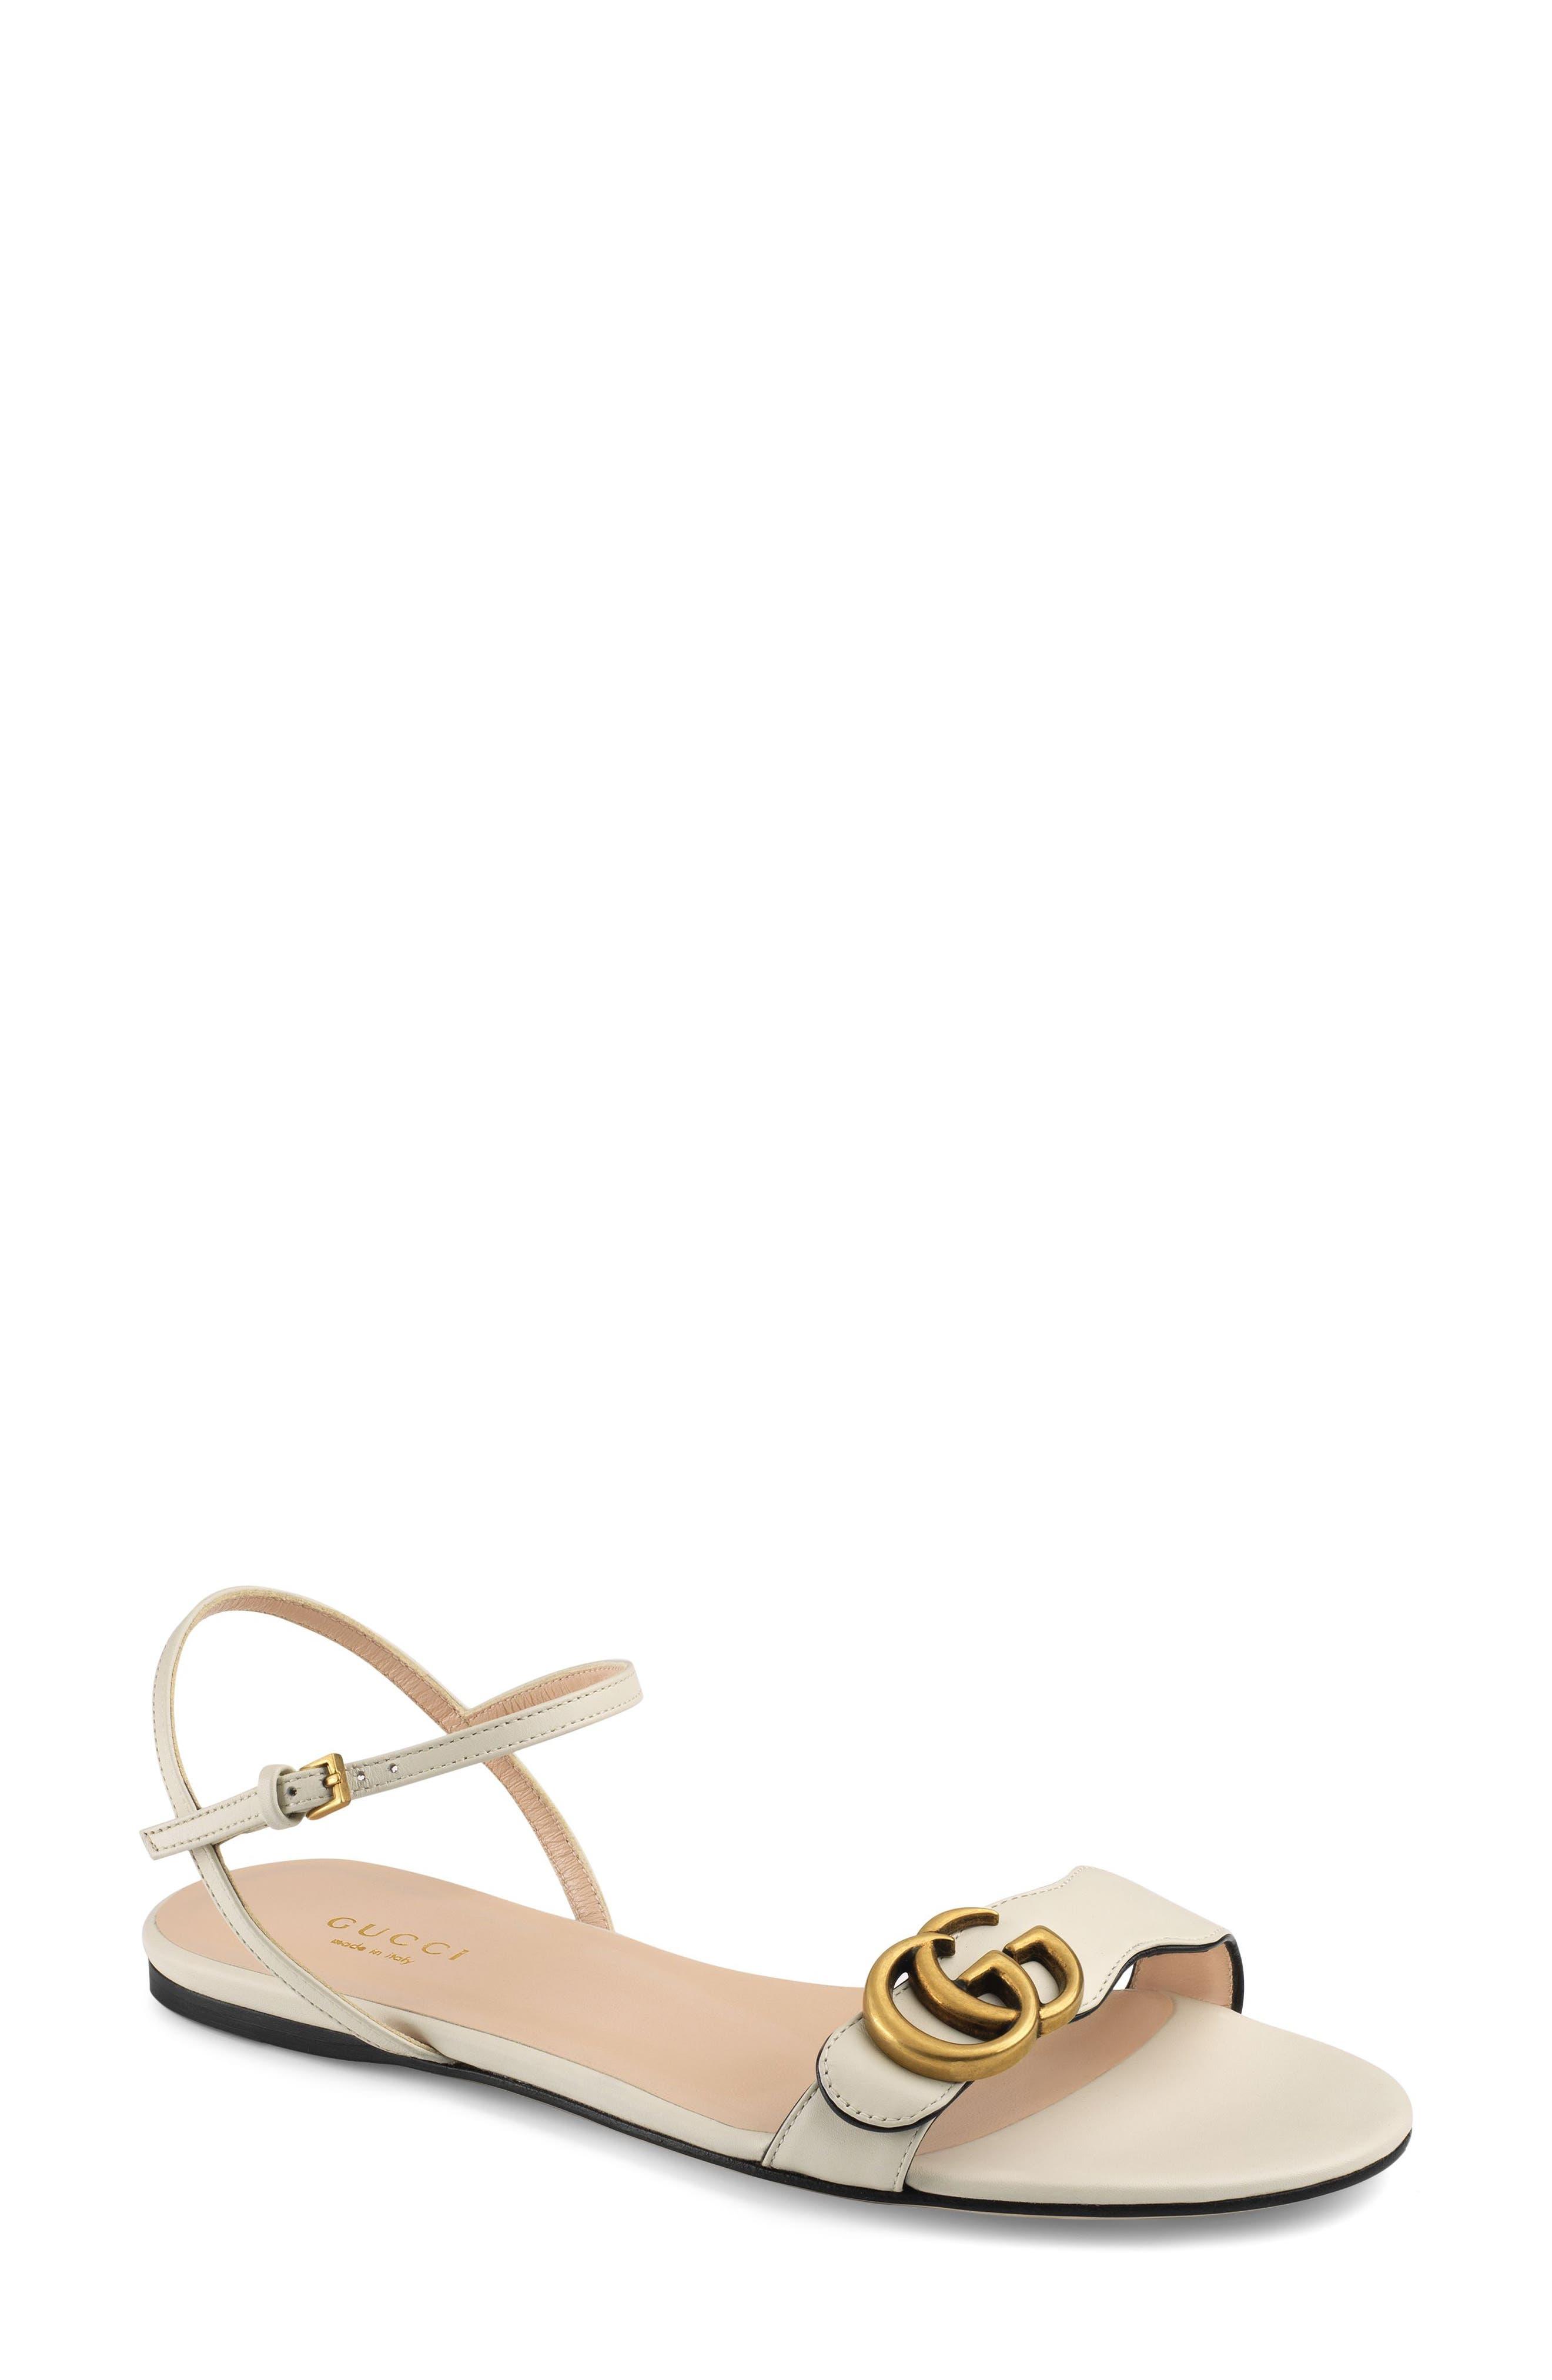 GUCCI, Marmont Quarter Strap Flat Sandal, Main thumbnail 1, color, MYSTIC WHITE